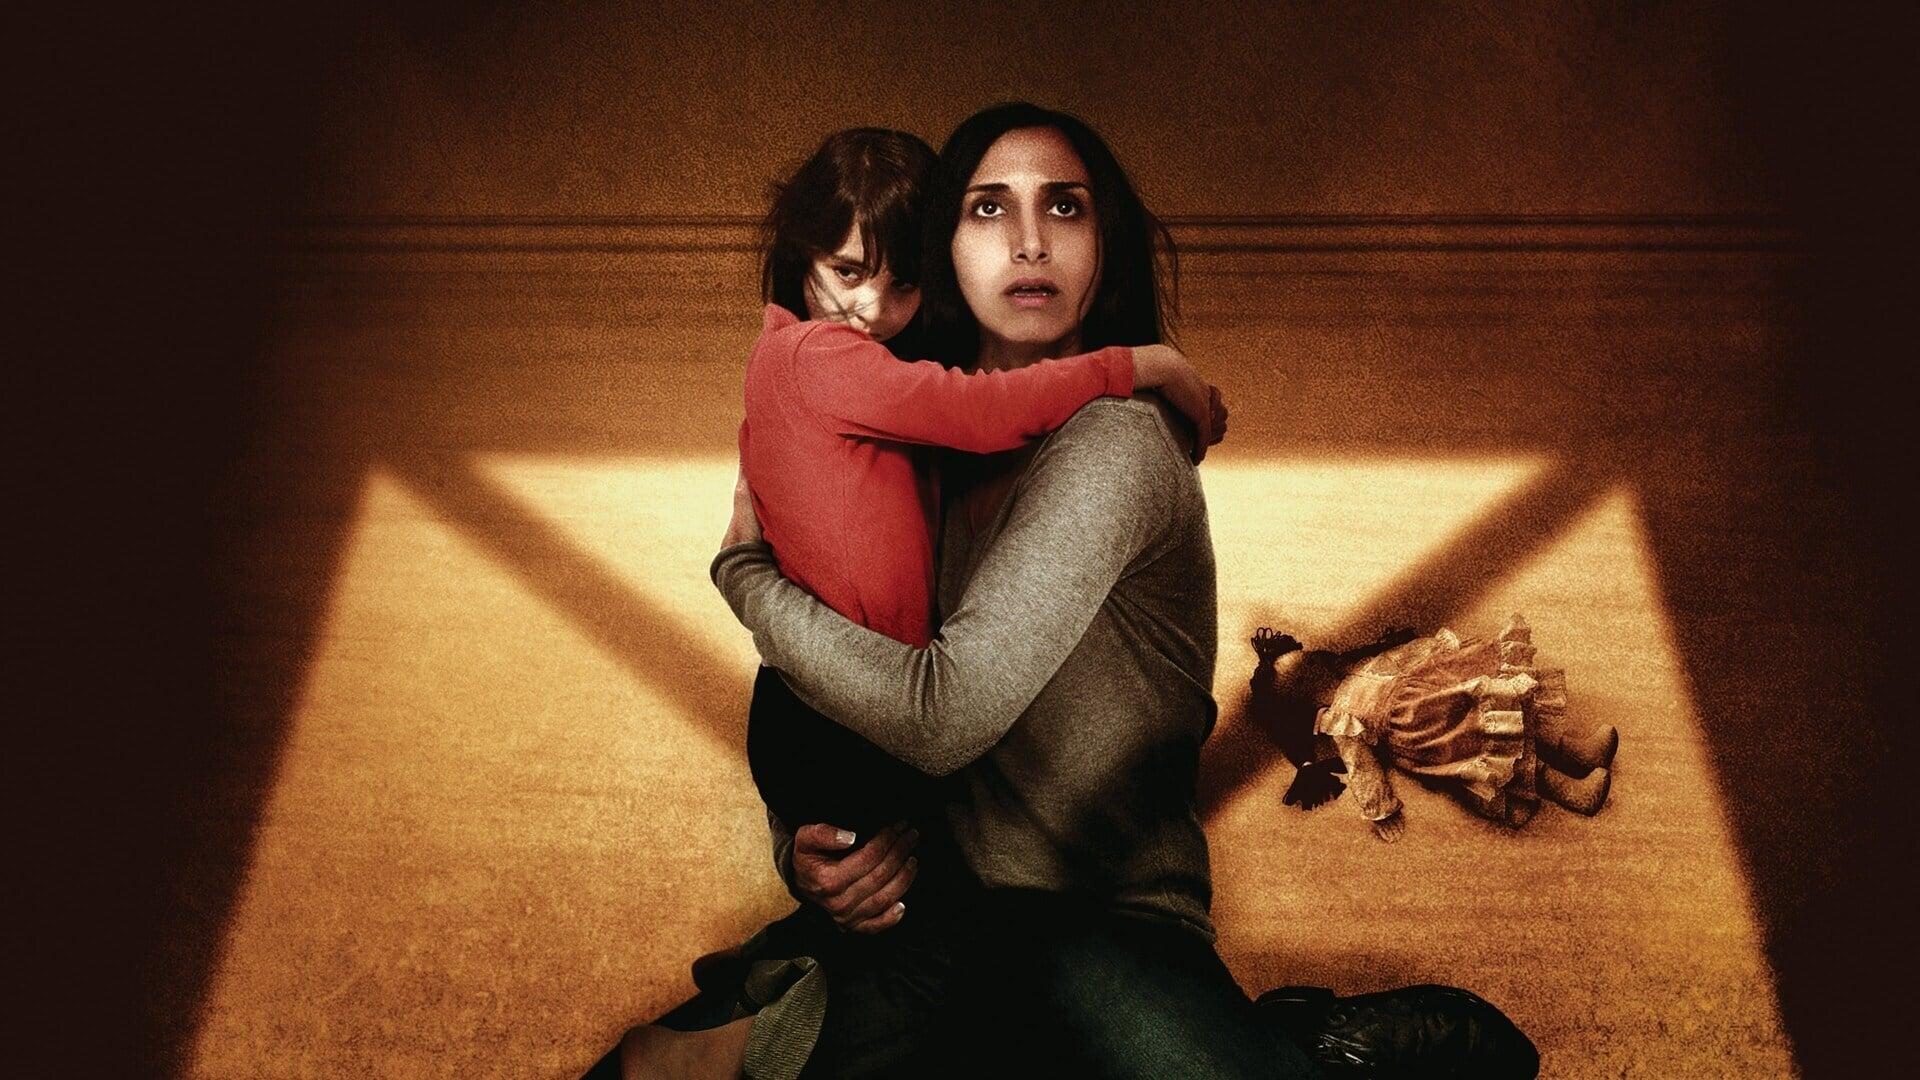 The Best International Movies on Netflix